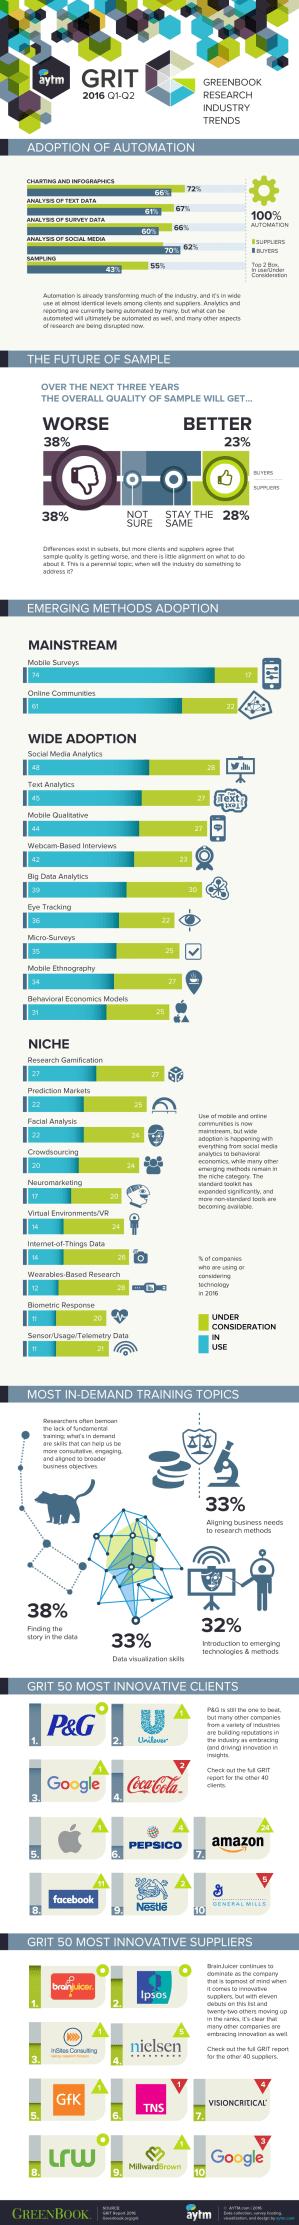 GRIT_AYTM_Infographic_2016